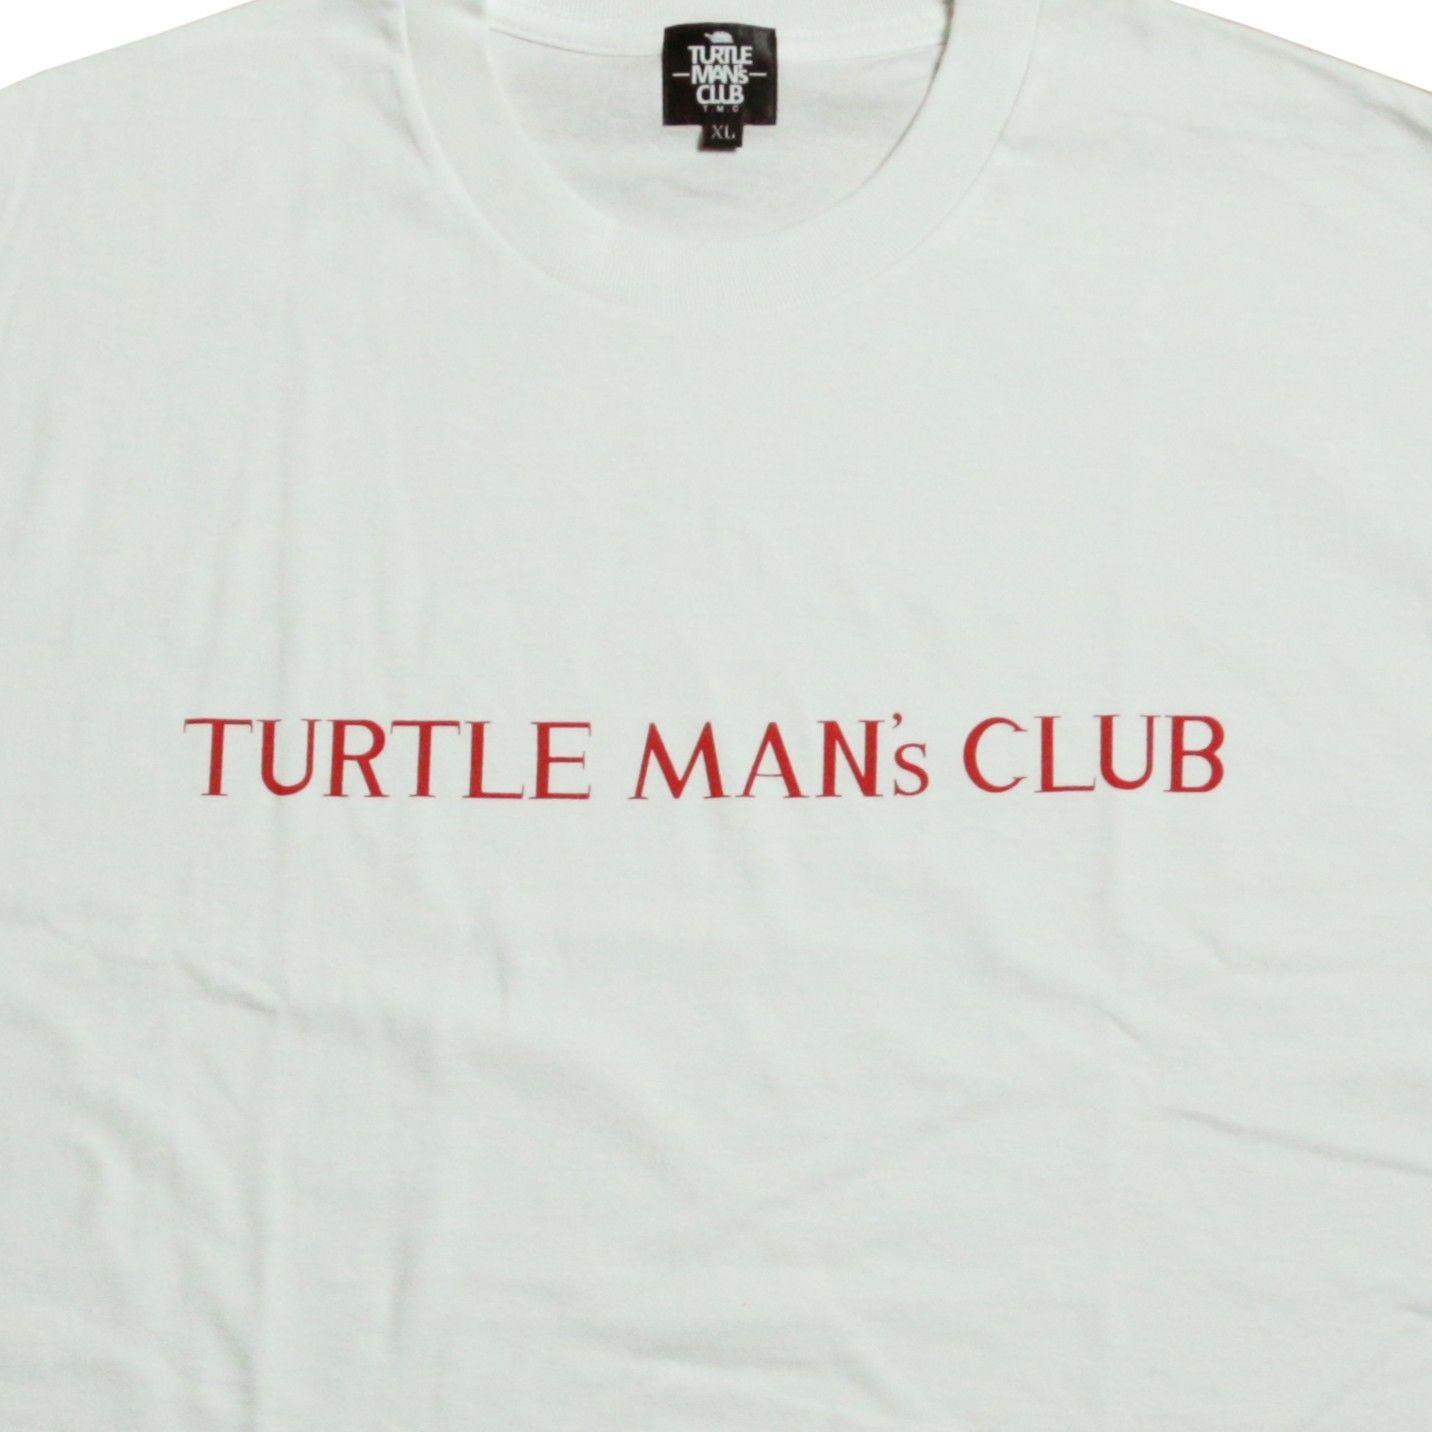 TURTLE MAN's CLUB T-SHIRTS   [WHT/RED] 【再入荷予約】